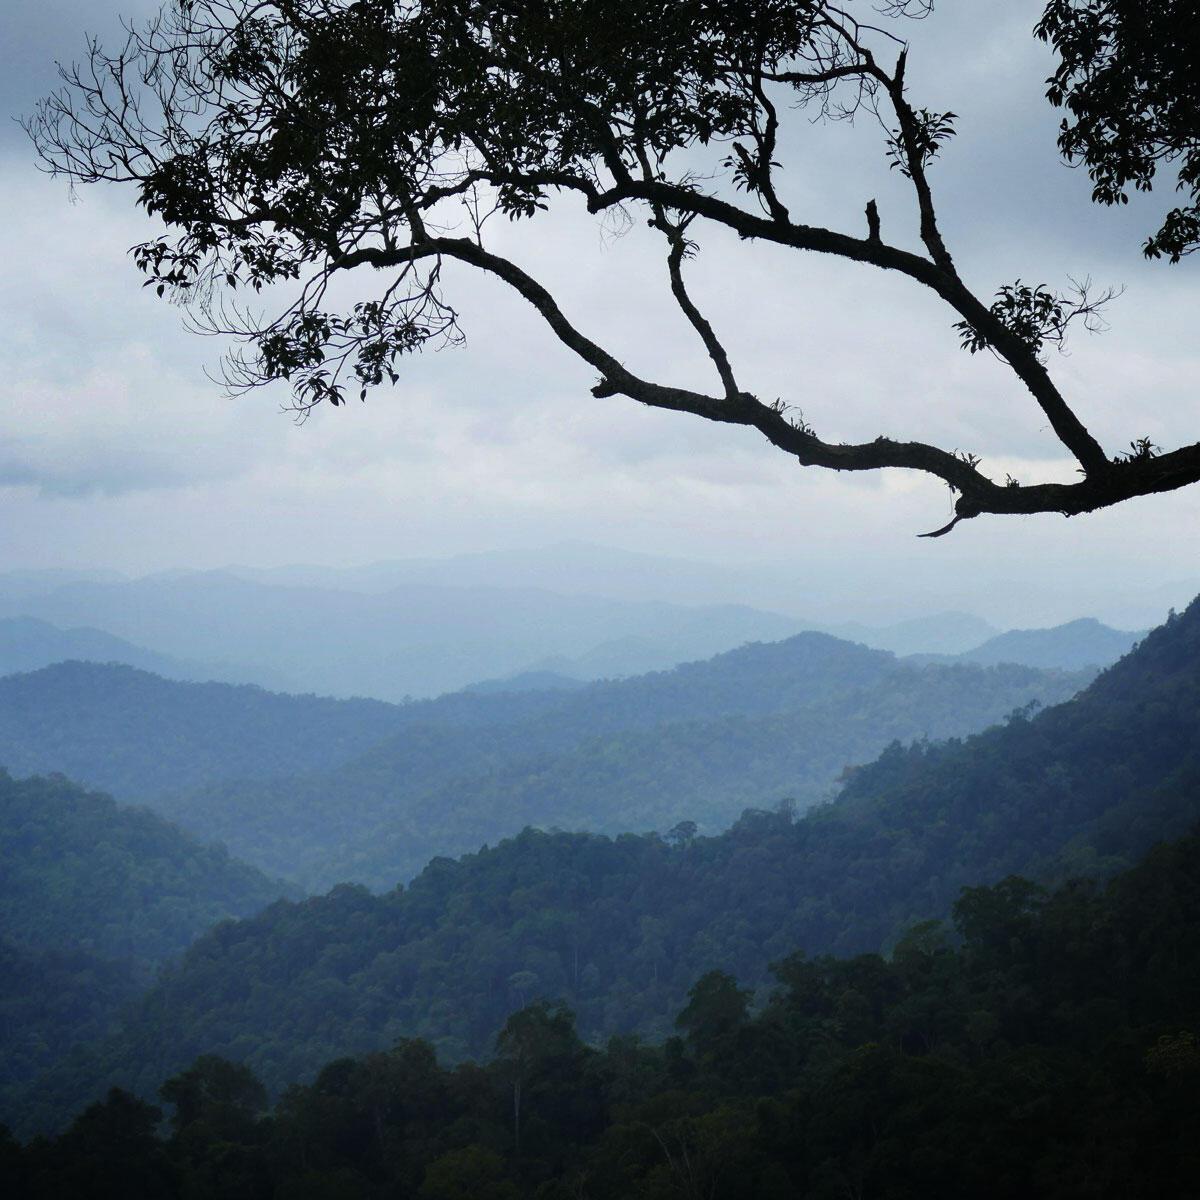 Rugged forest recedes westward into Myanmar. Noah Strycker